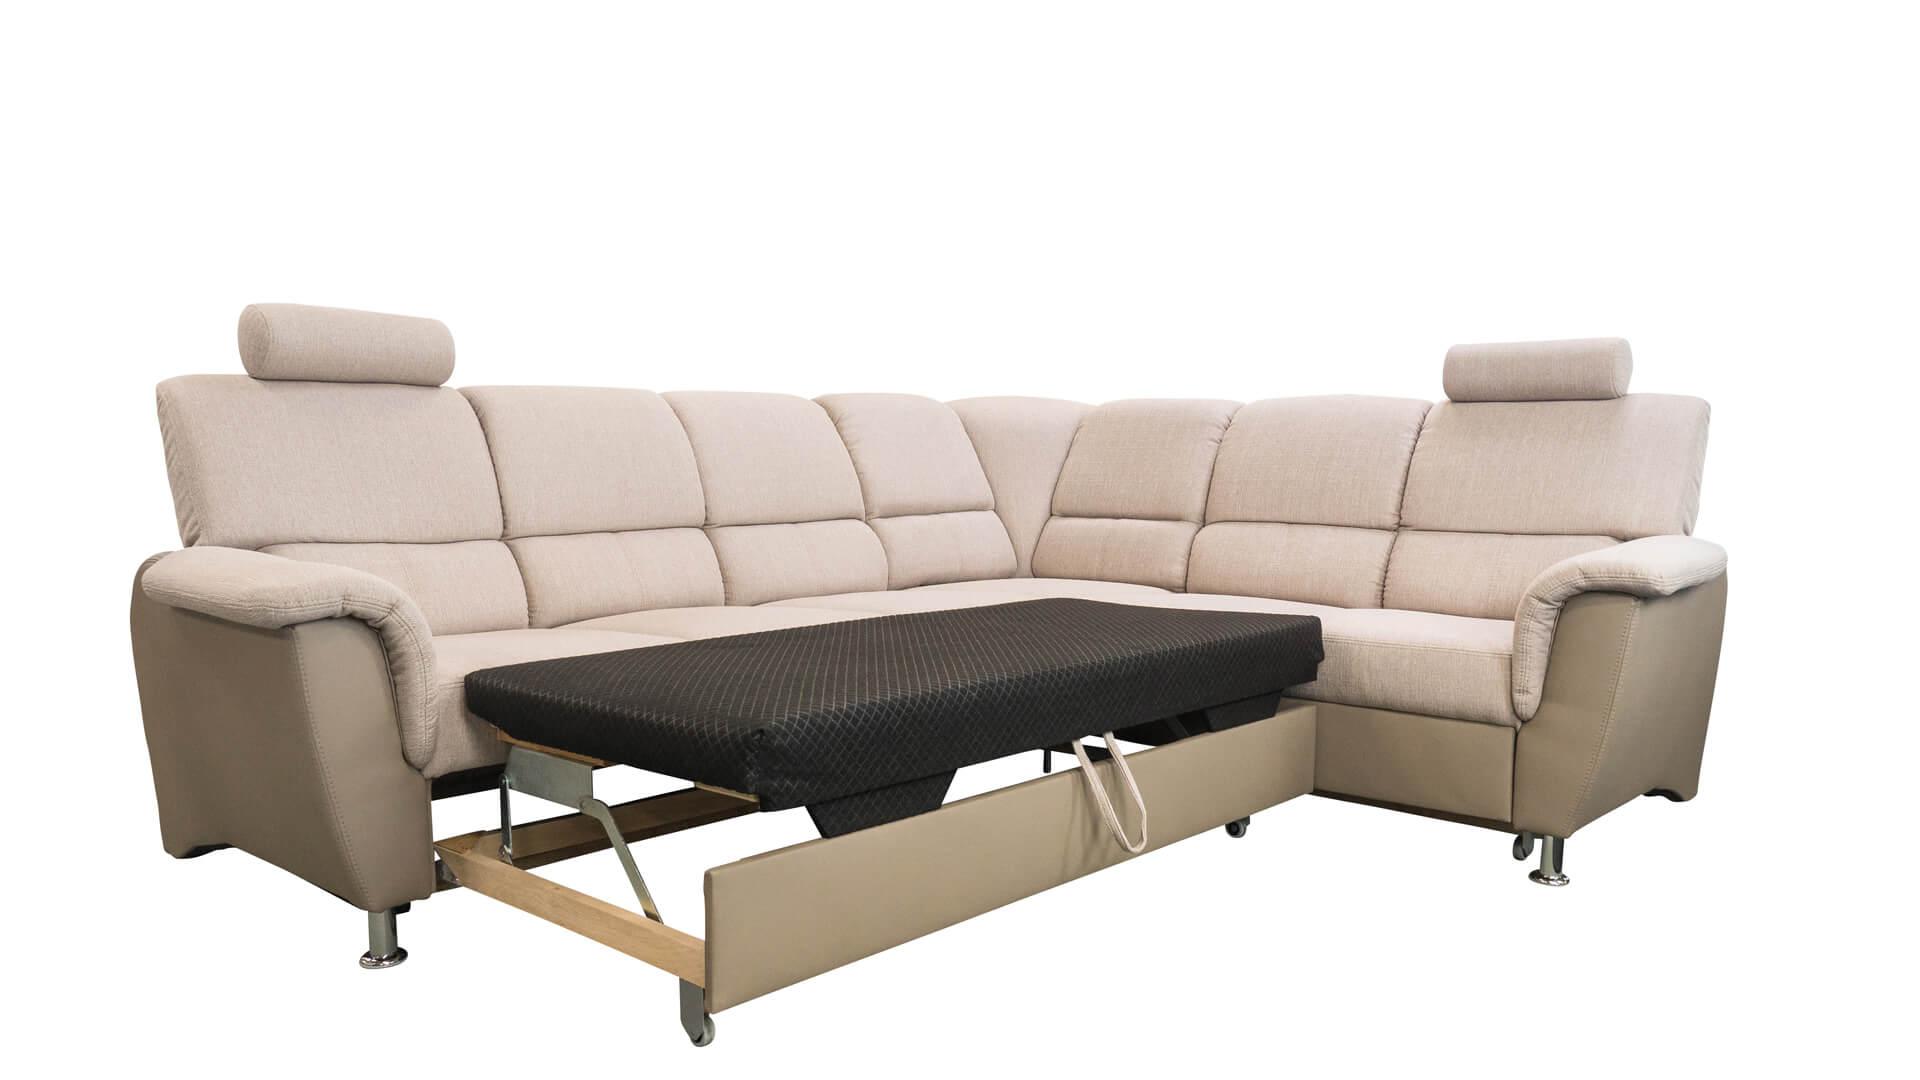 Full Size of Großes Ecksofa Grosses Schlaffunktion Sofa Bezug Mit Ottomane Regal Garten Bild Wohnzimmer Bett Wohnzimmer Großes Ecksofa